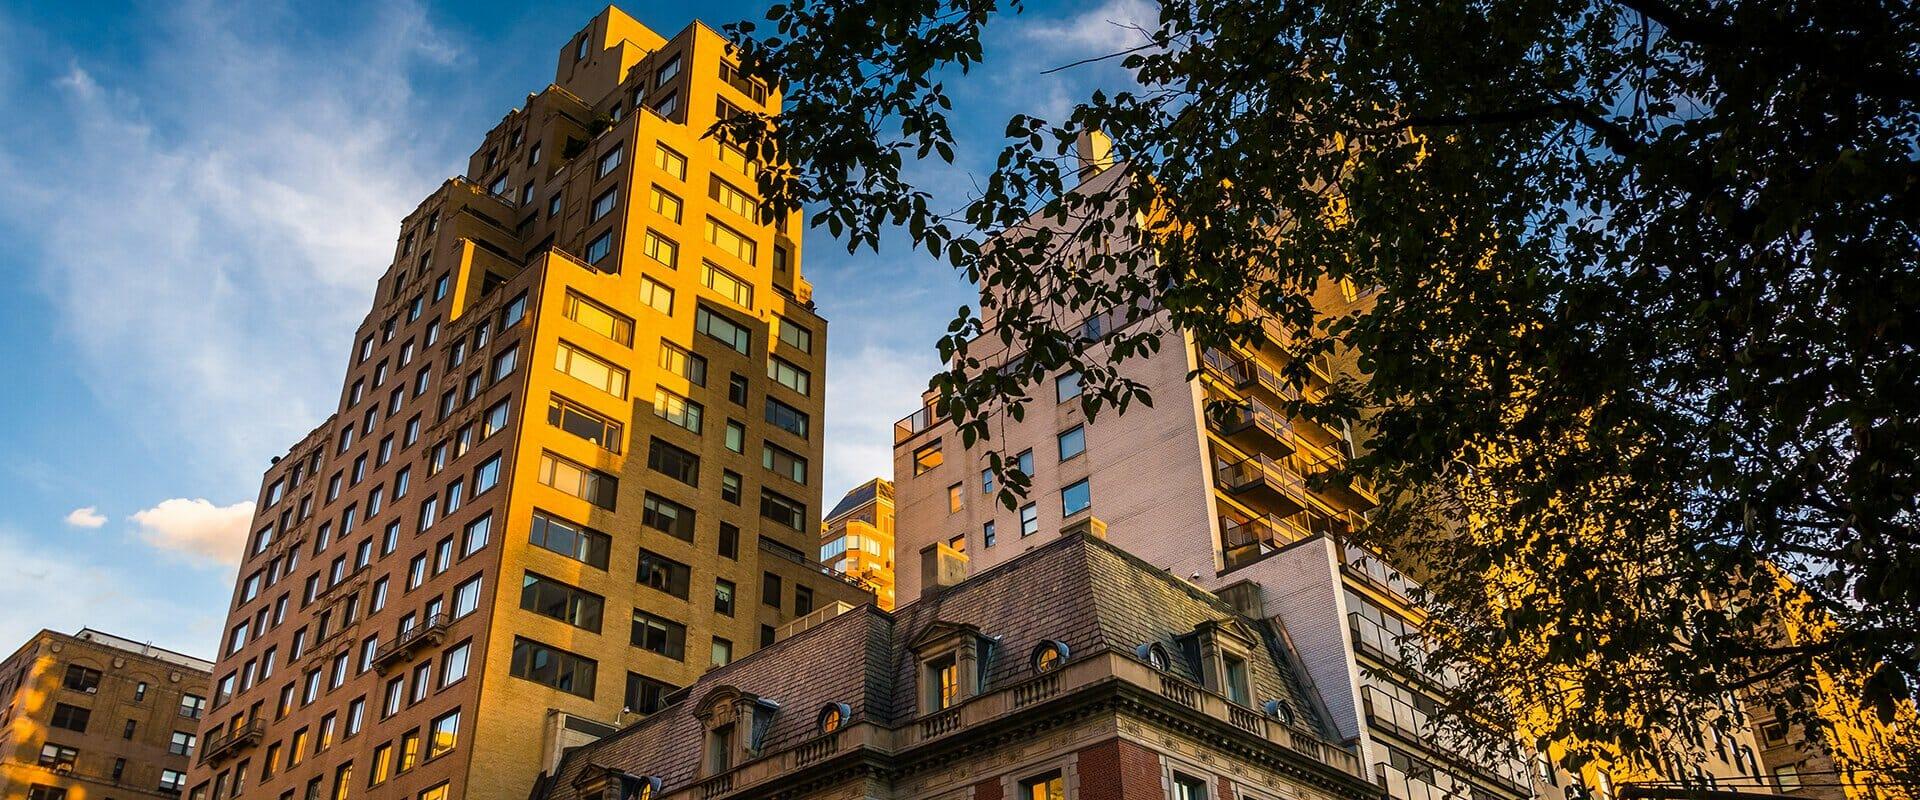 new york city rental property